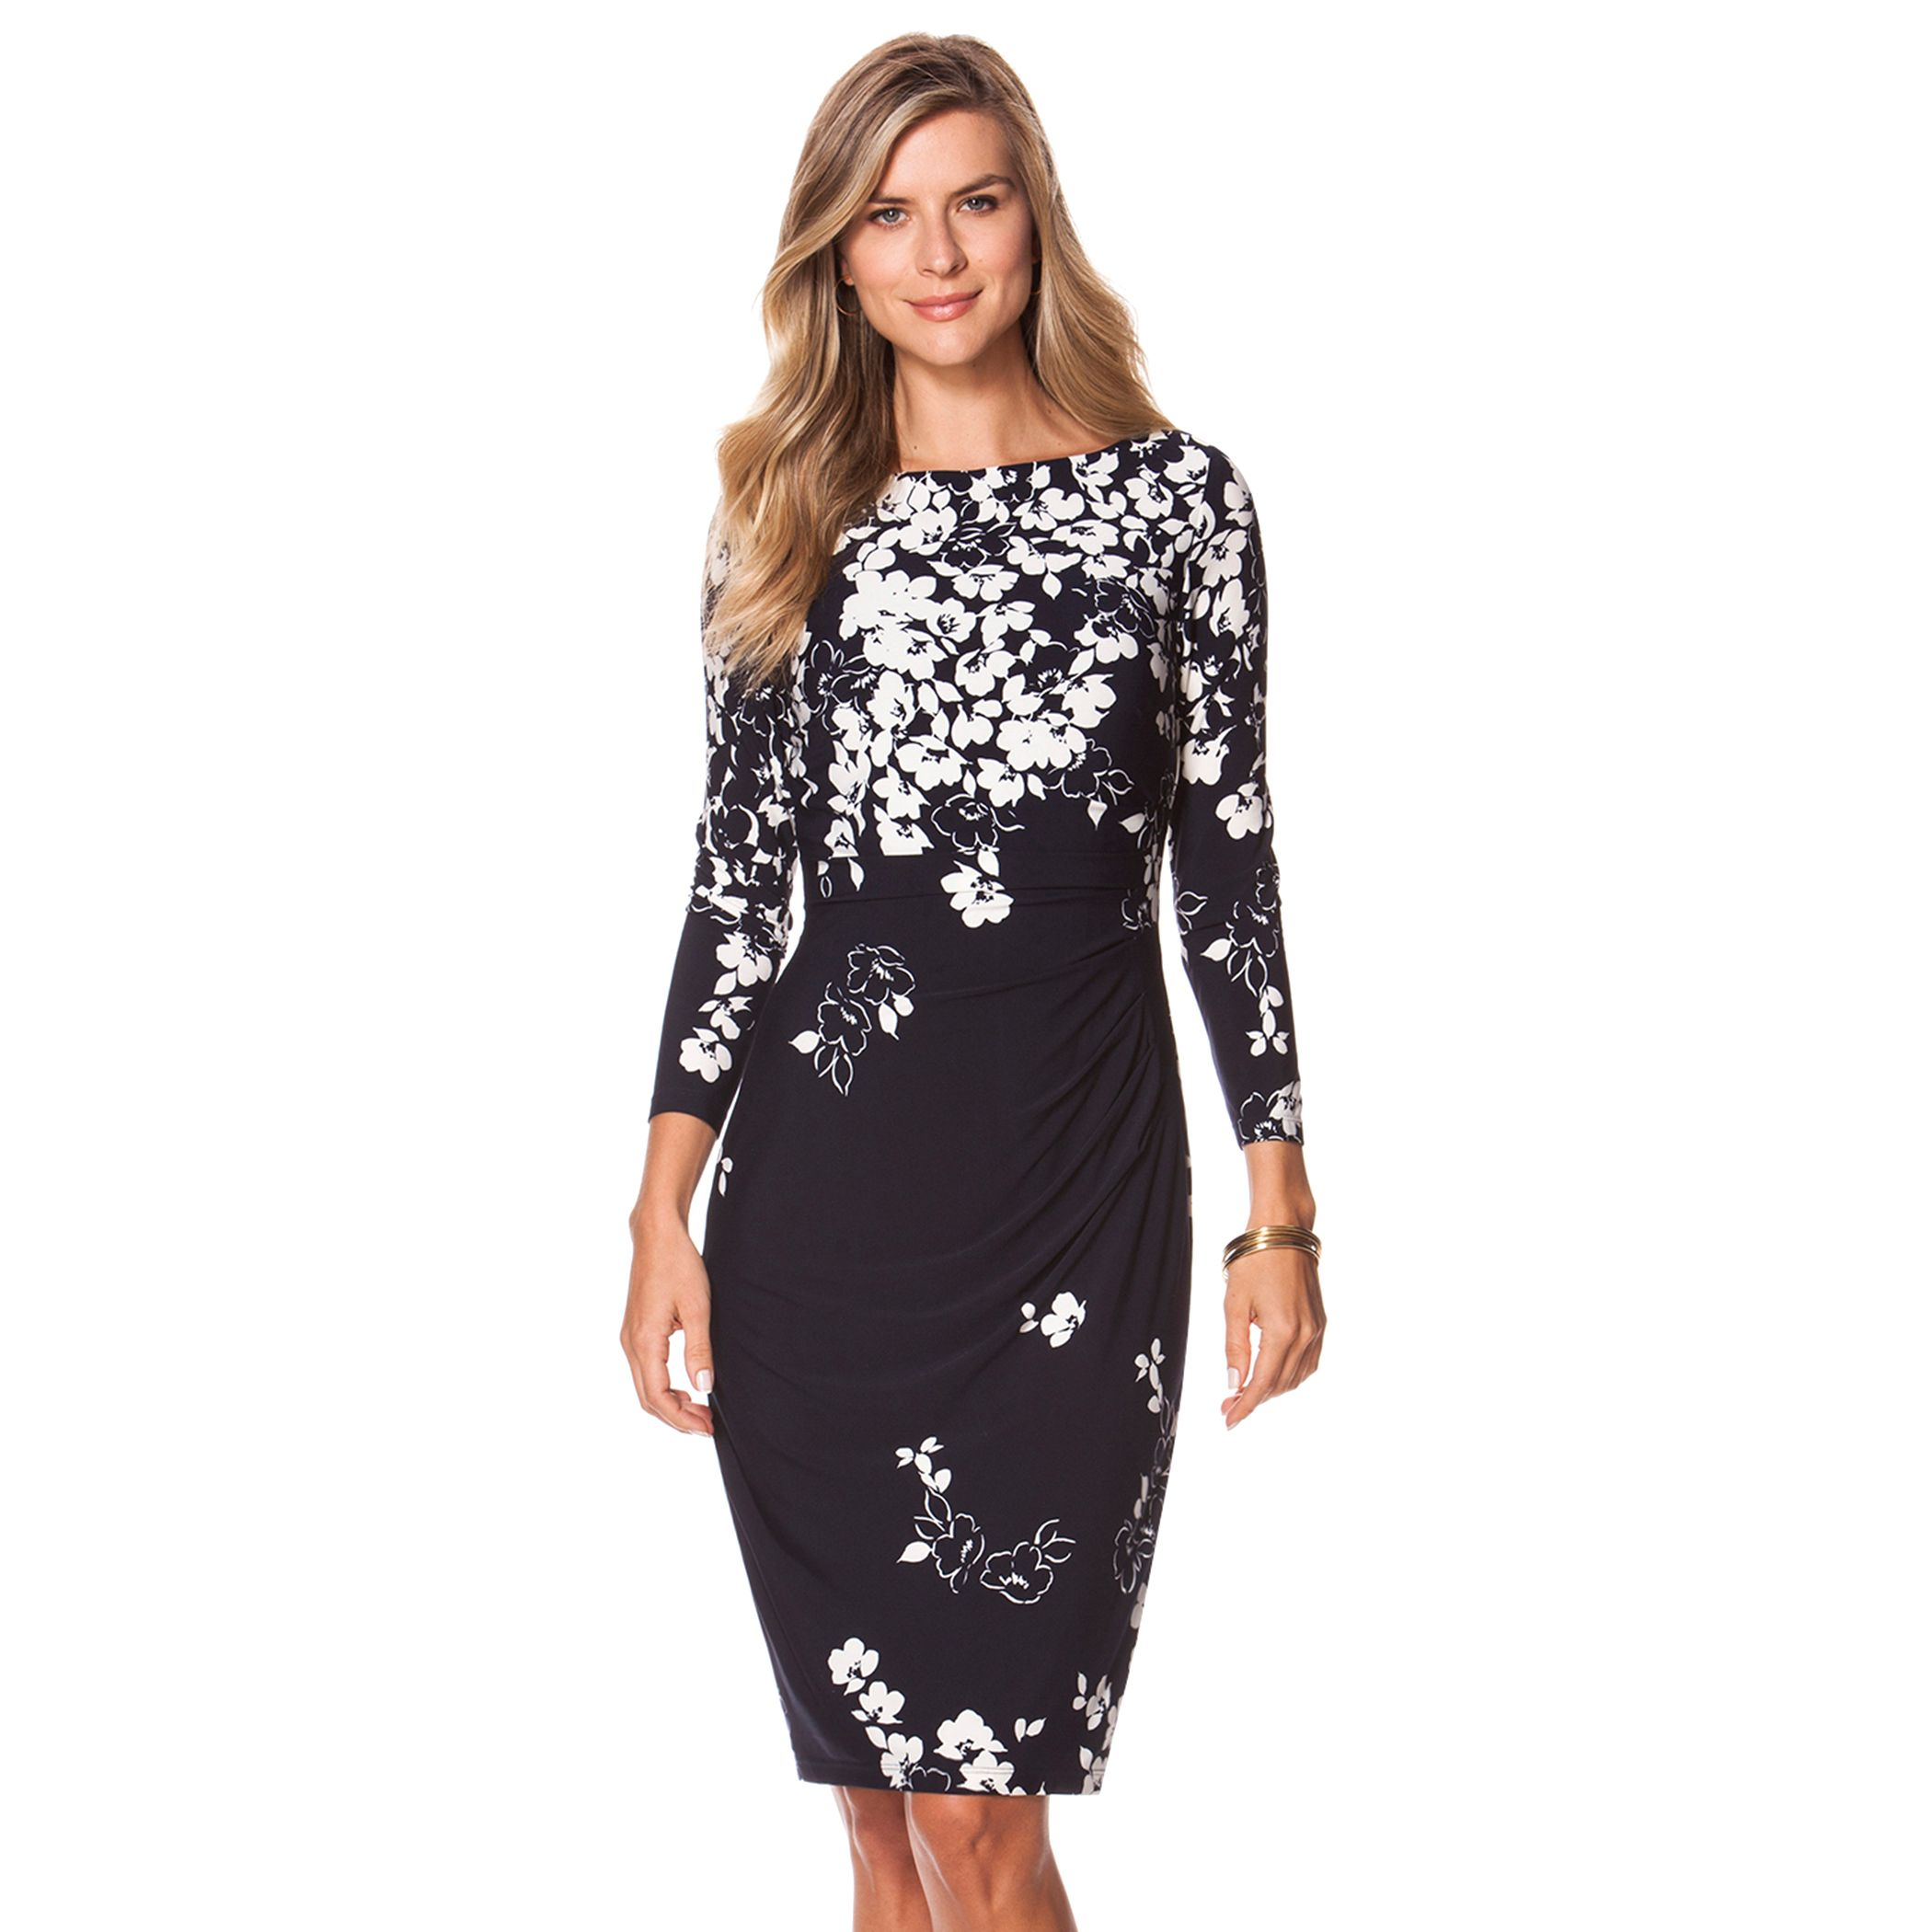 Kohls Dresses For Weddings 9 Cool Women us Chaps Sheath